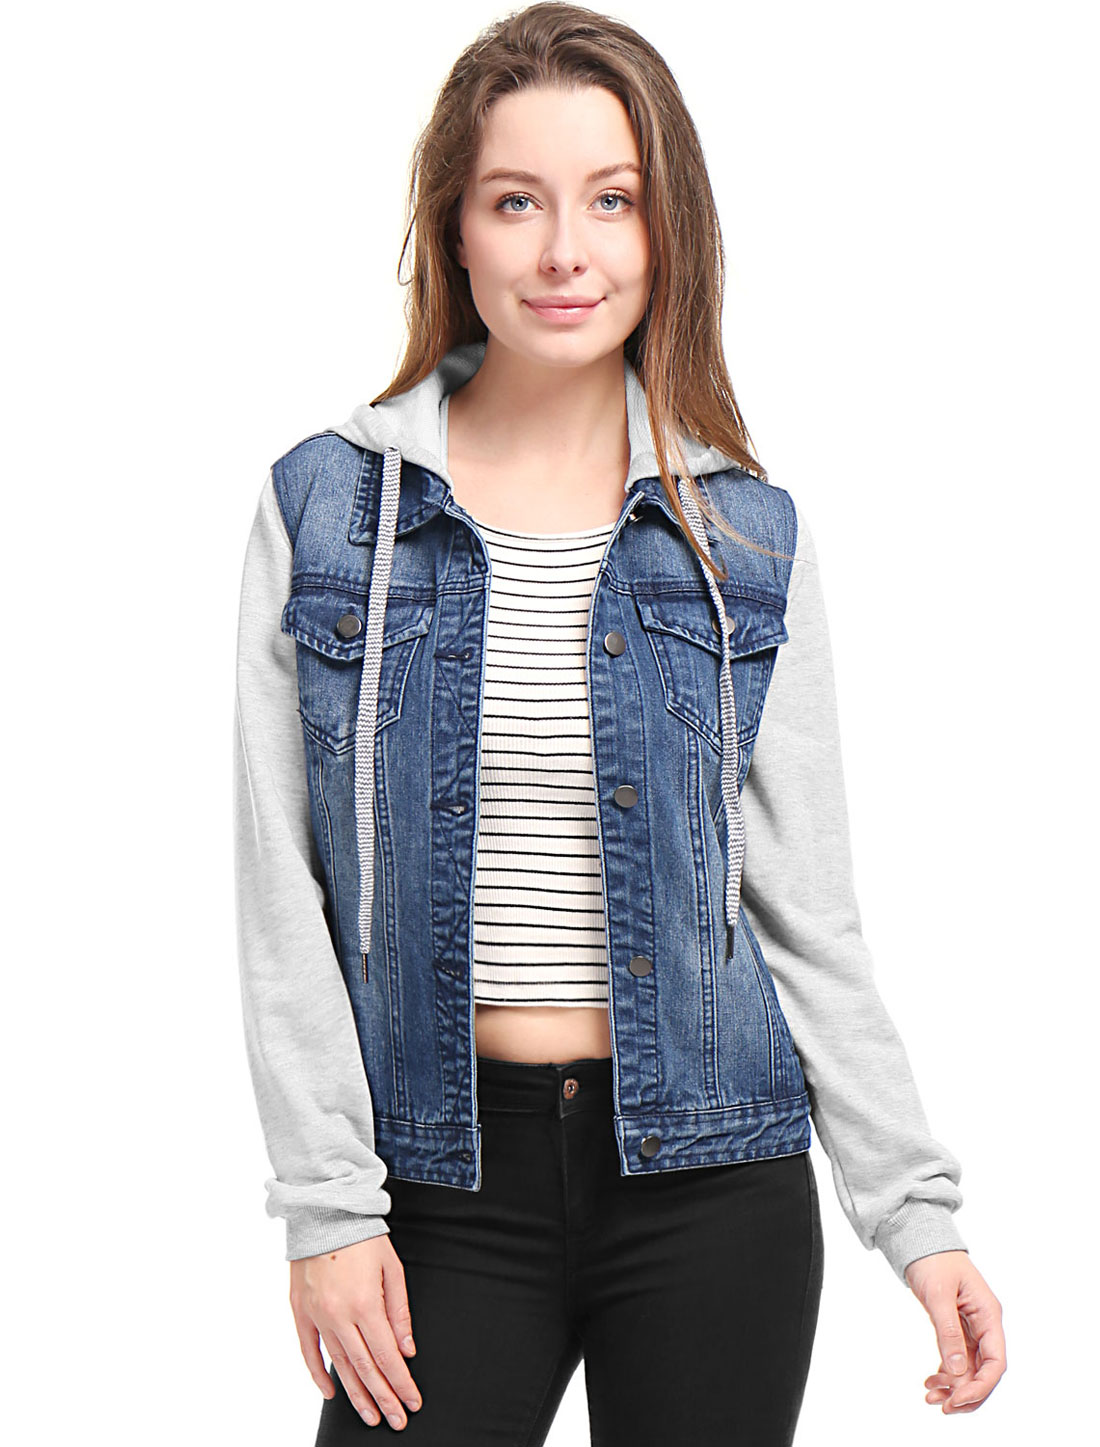 Women's Layered Long Sleeves Hooded Denim Jacket w Pockets Blue (Size L / 12)